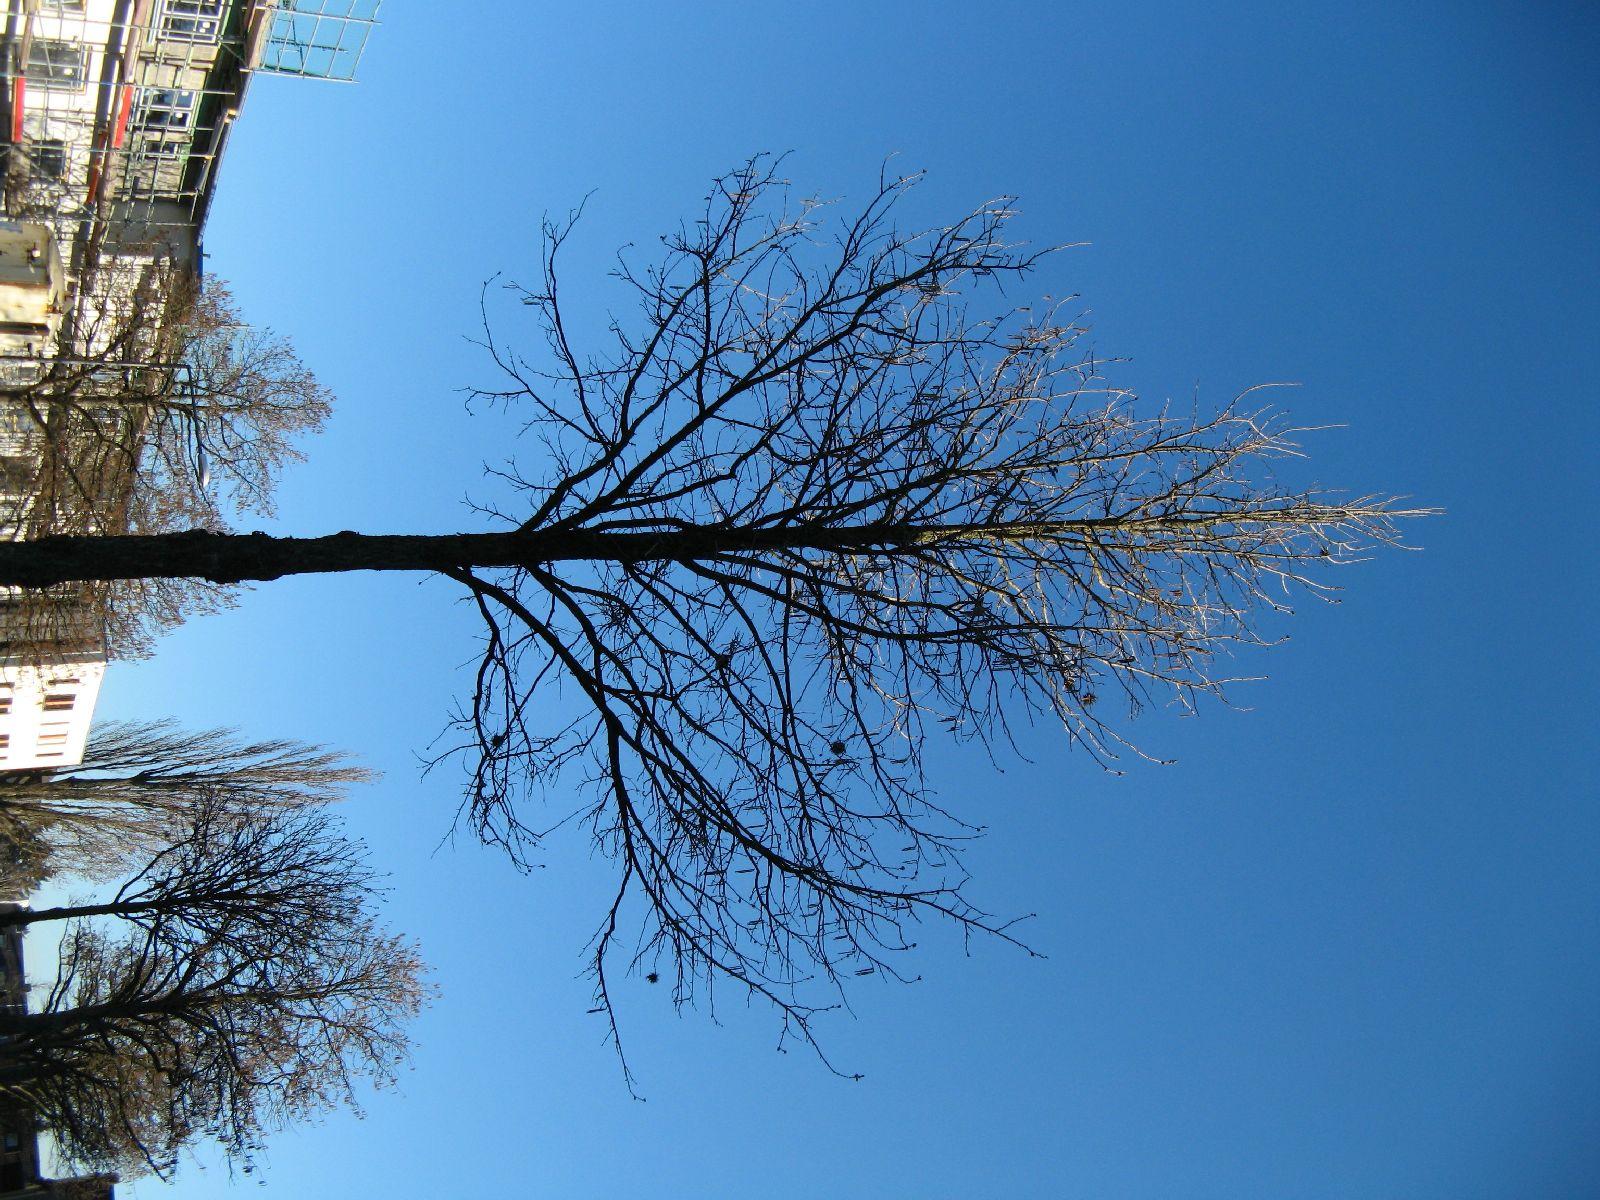 Plants-Trees_Photo_Texture_B_42360